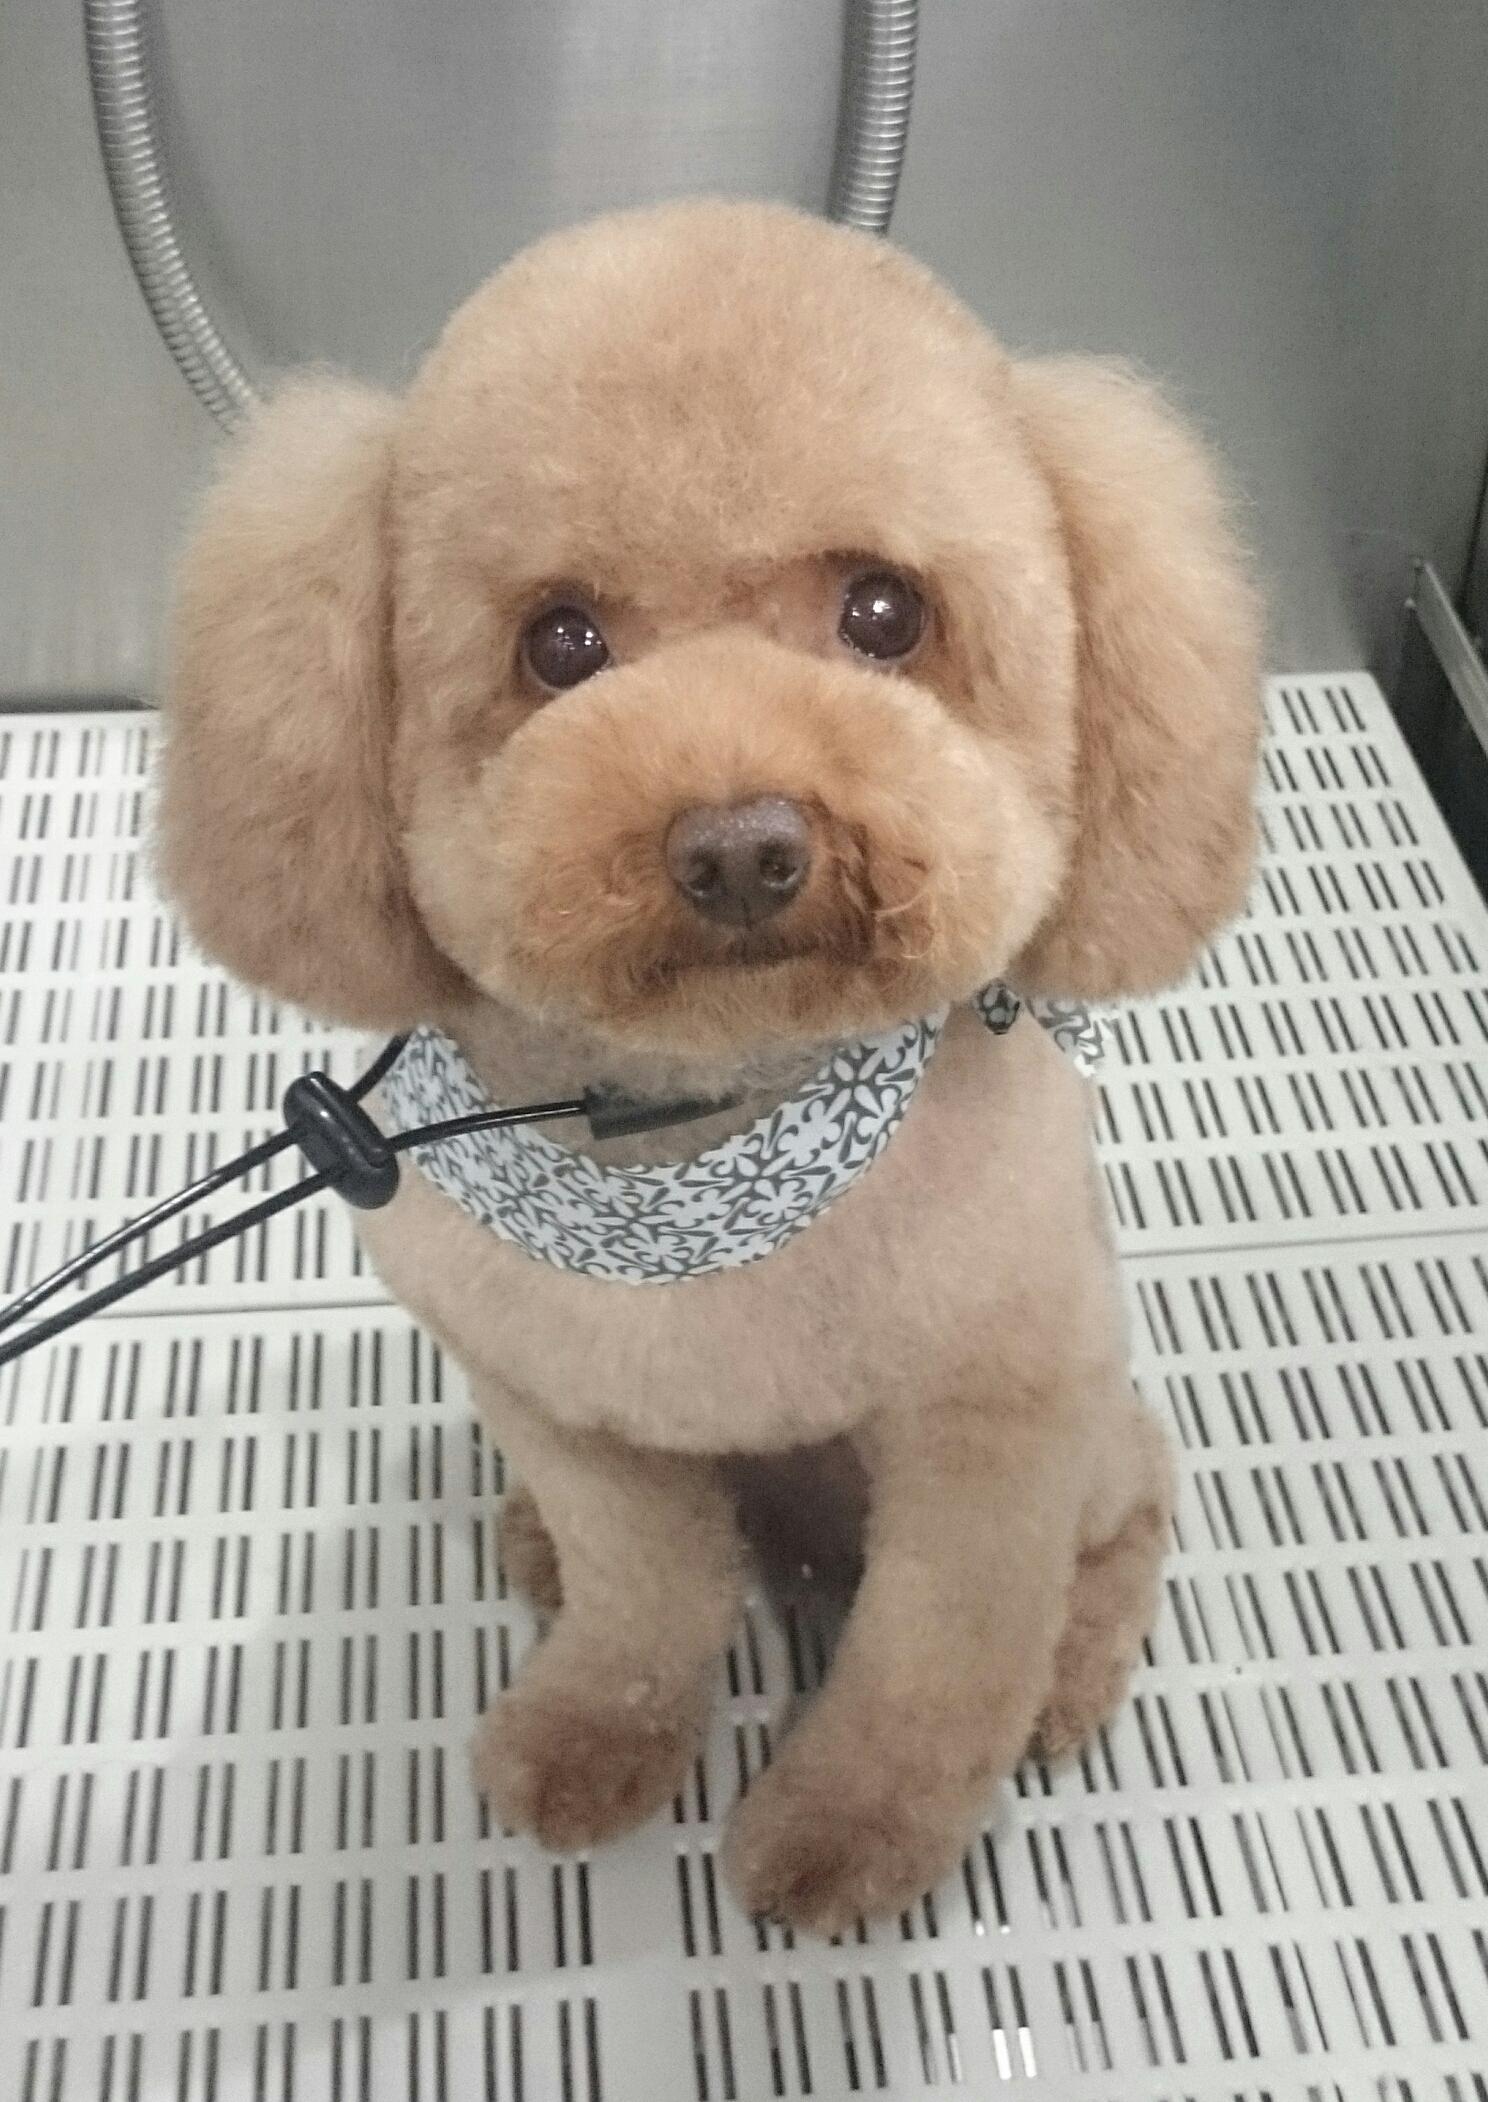 Teddy Bear with Puffy Round Ears